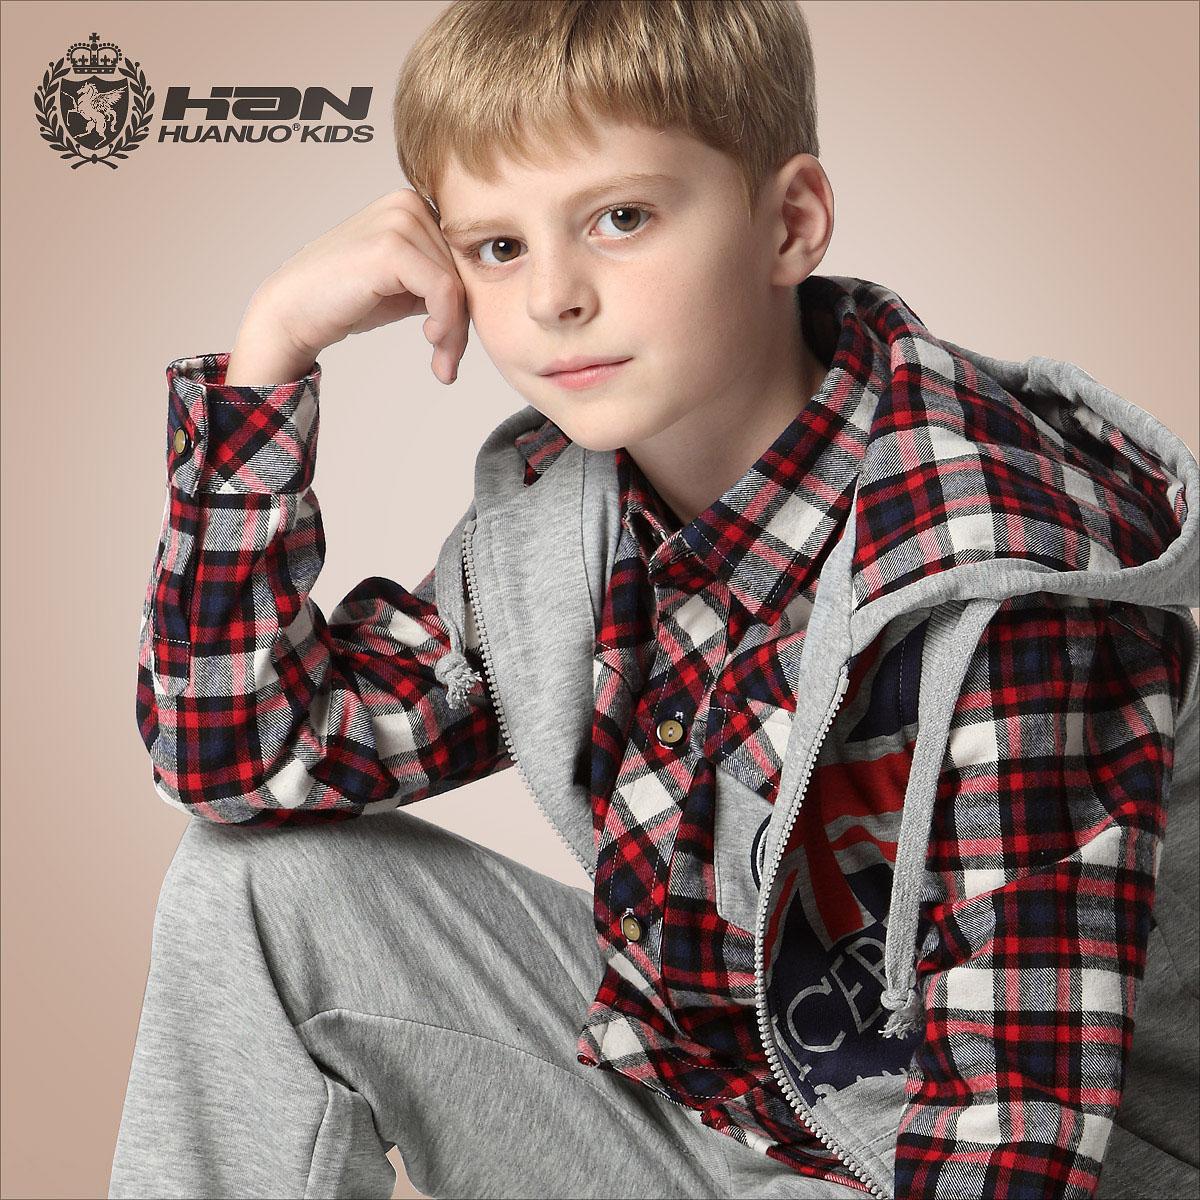 Teen Boy Clothing 3 Piece Suit Set Shirt Sleeveless